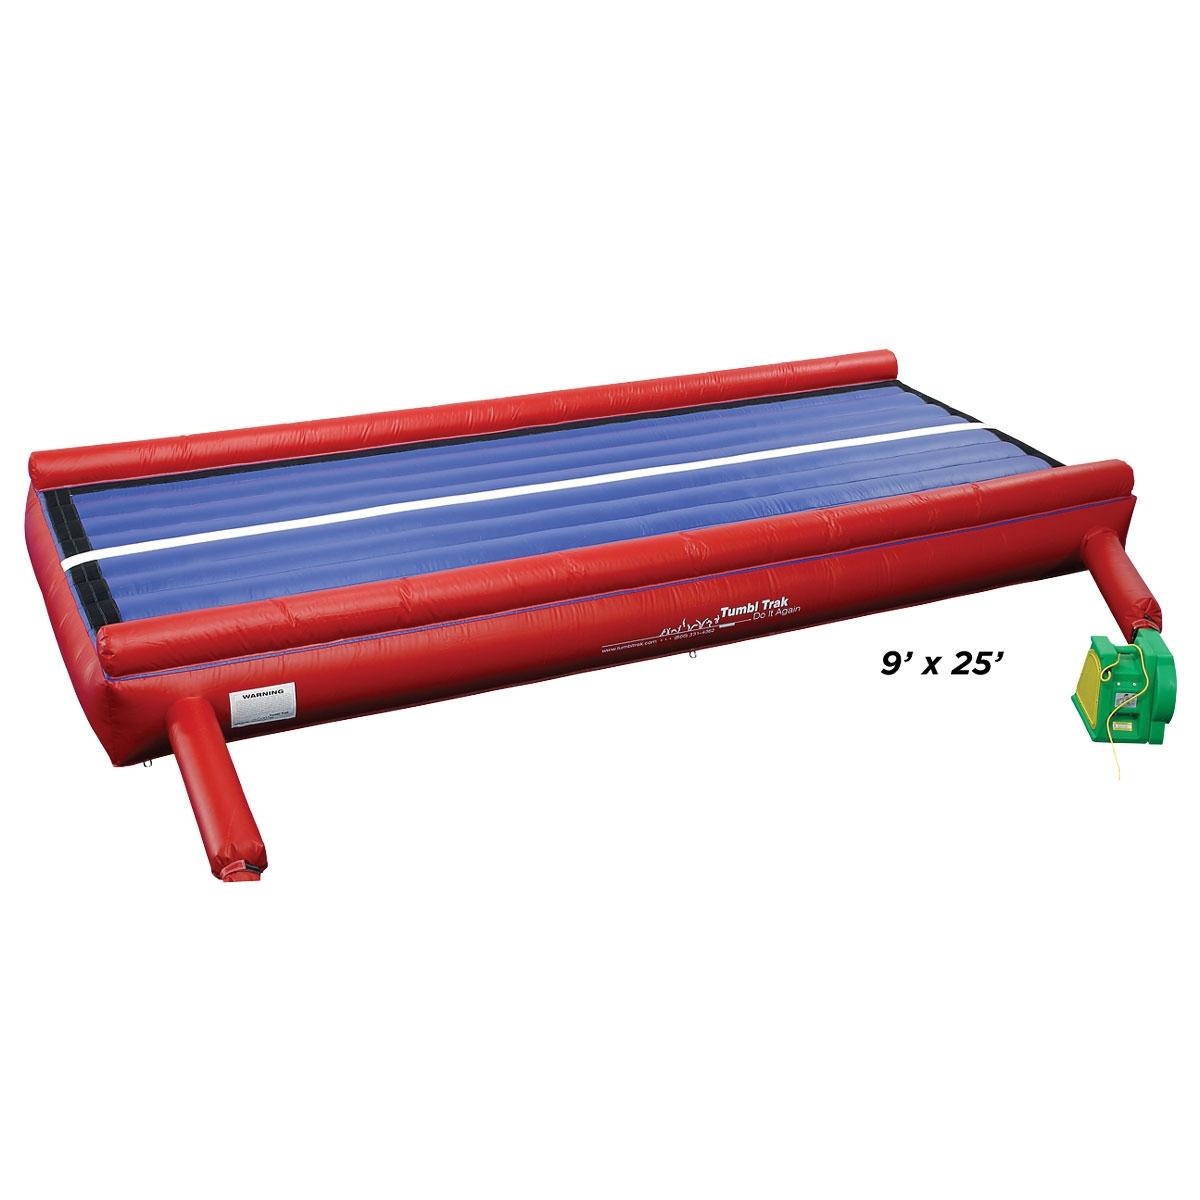 red air trak for gymnastics tumbling training | mancino mats